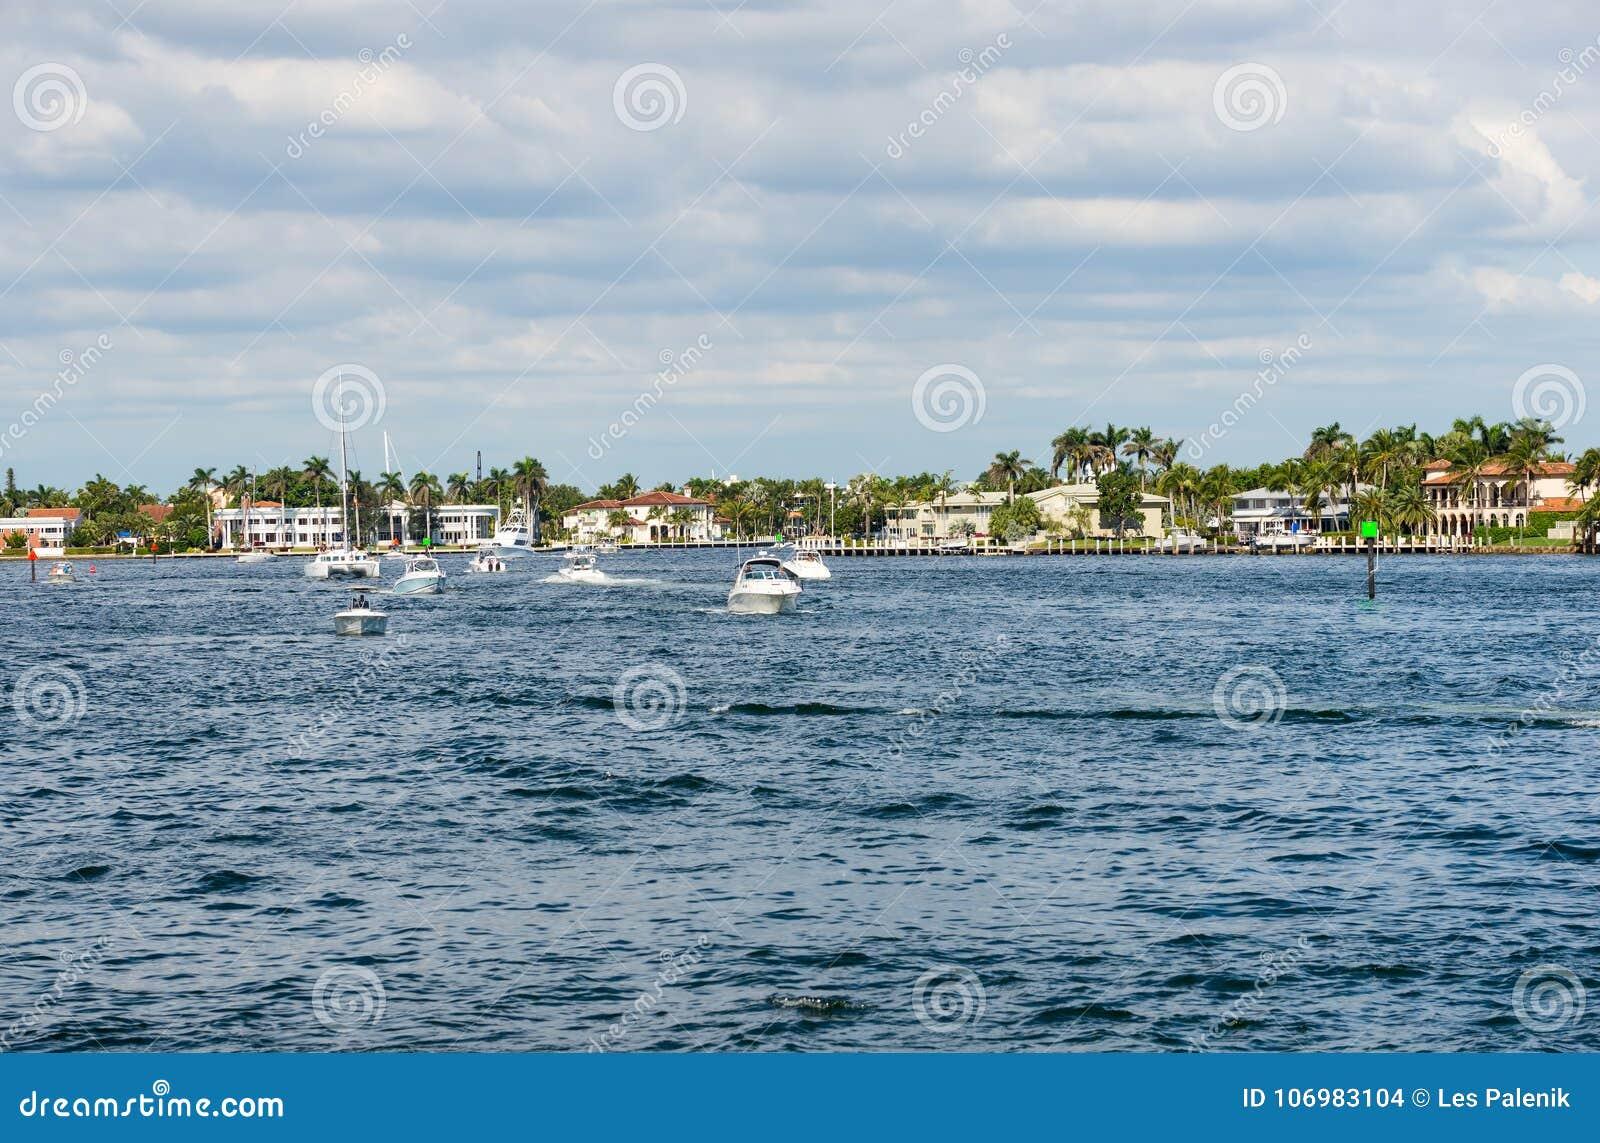 Pleasure Boats On Intracoastal Waterway In Fort Lauderdale Stock